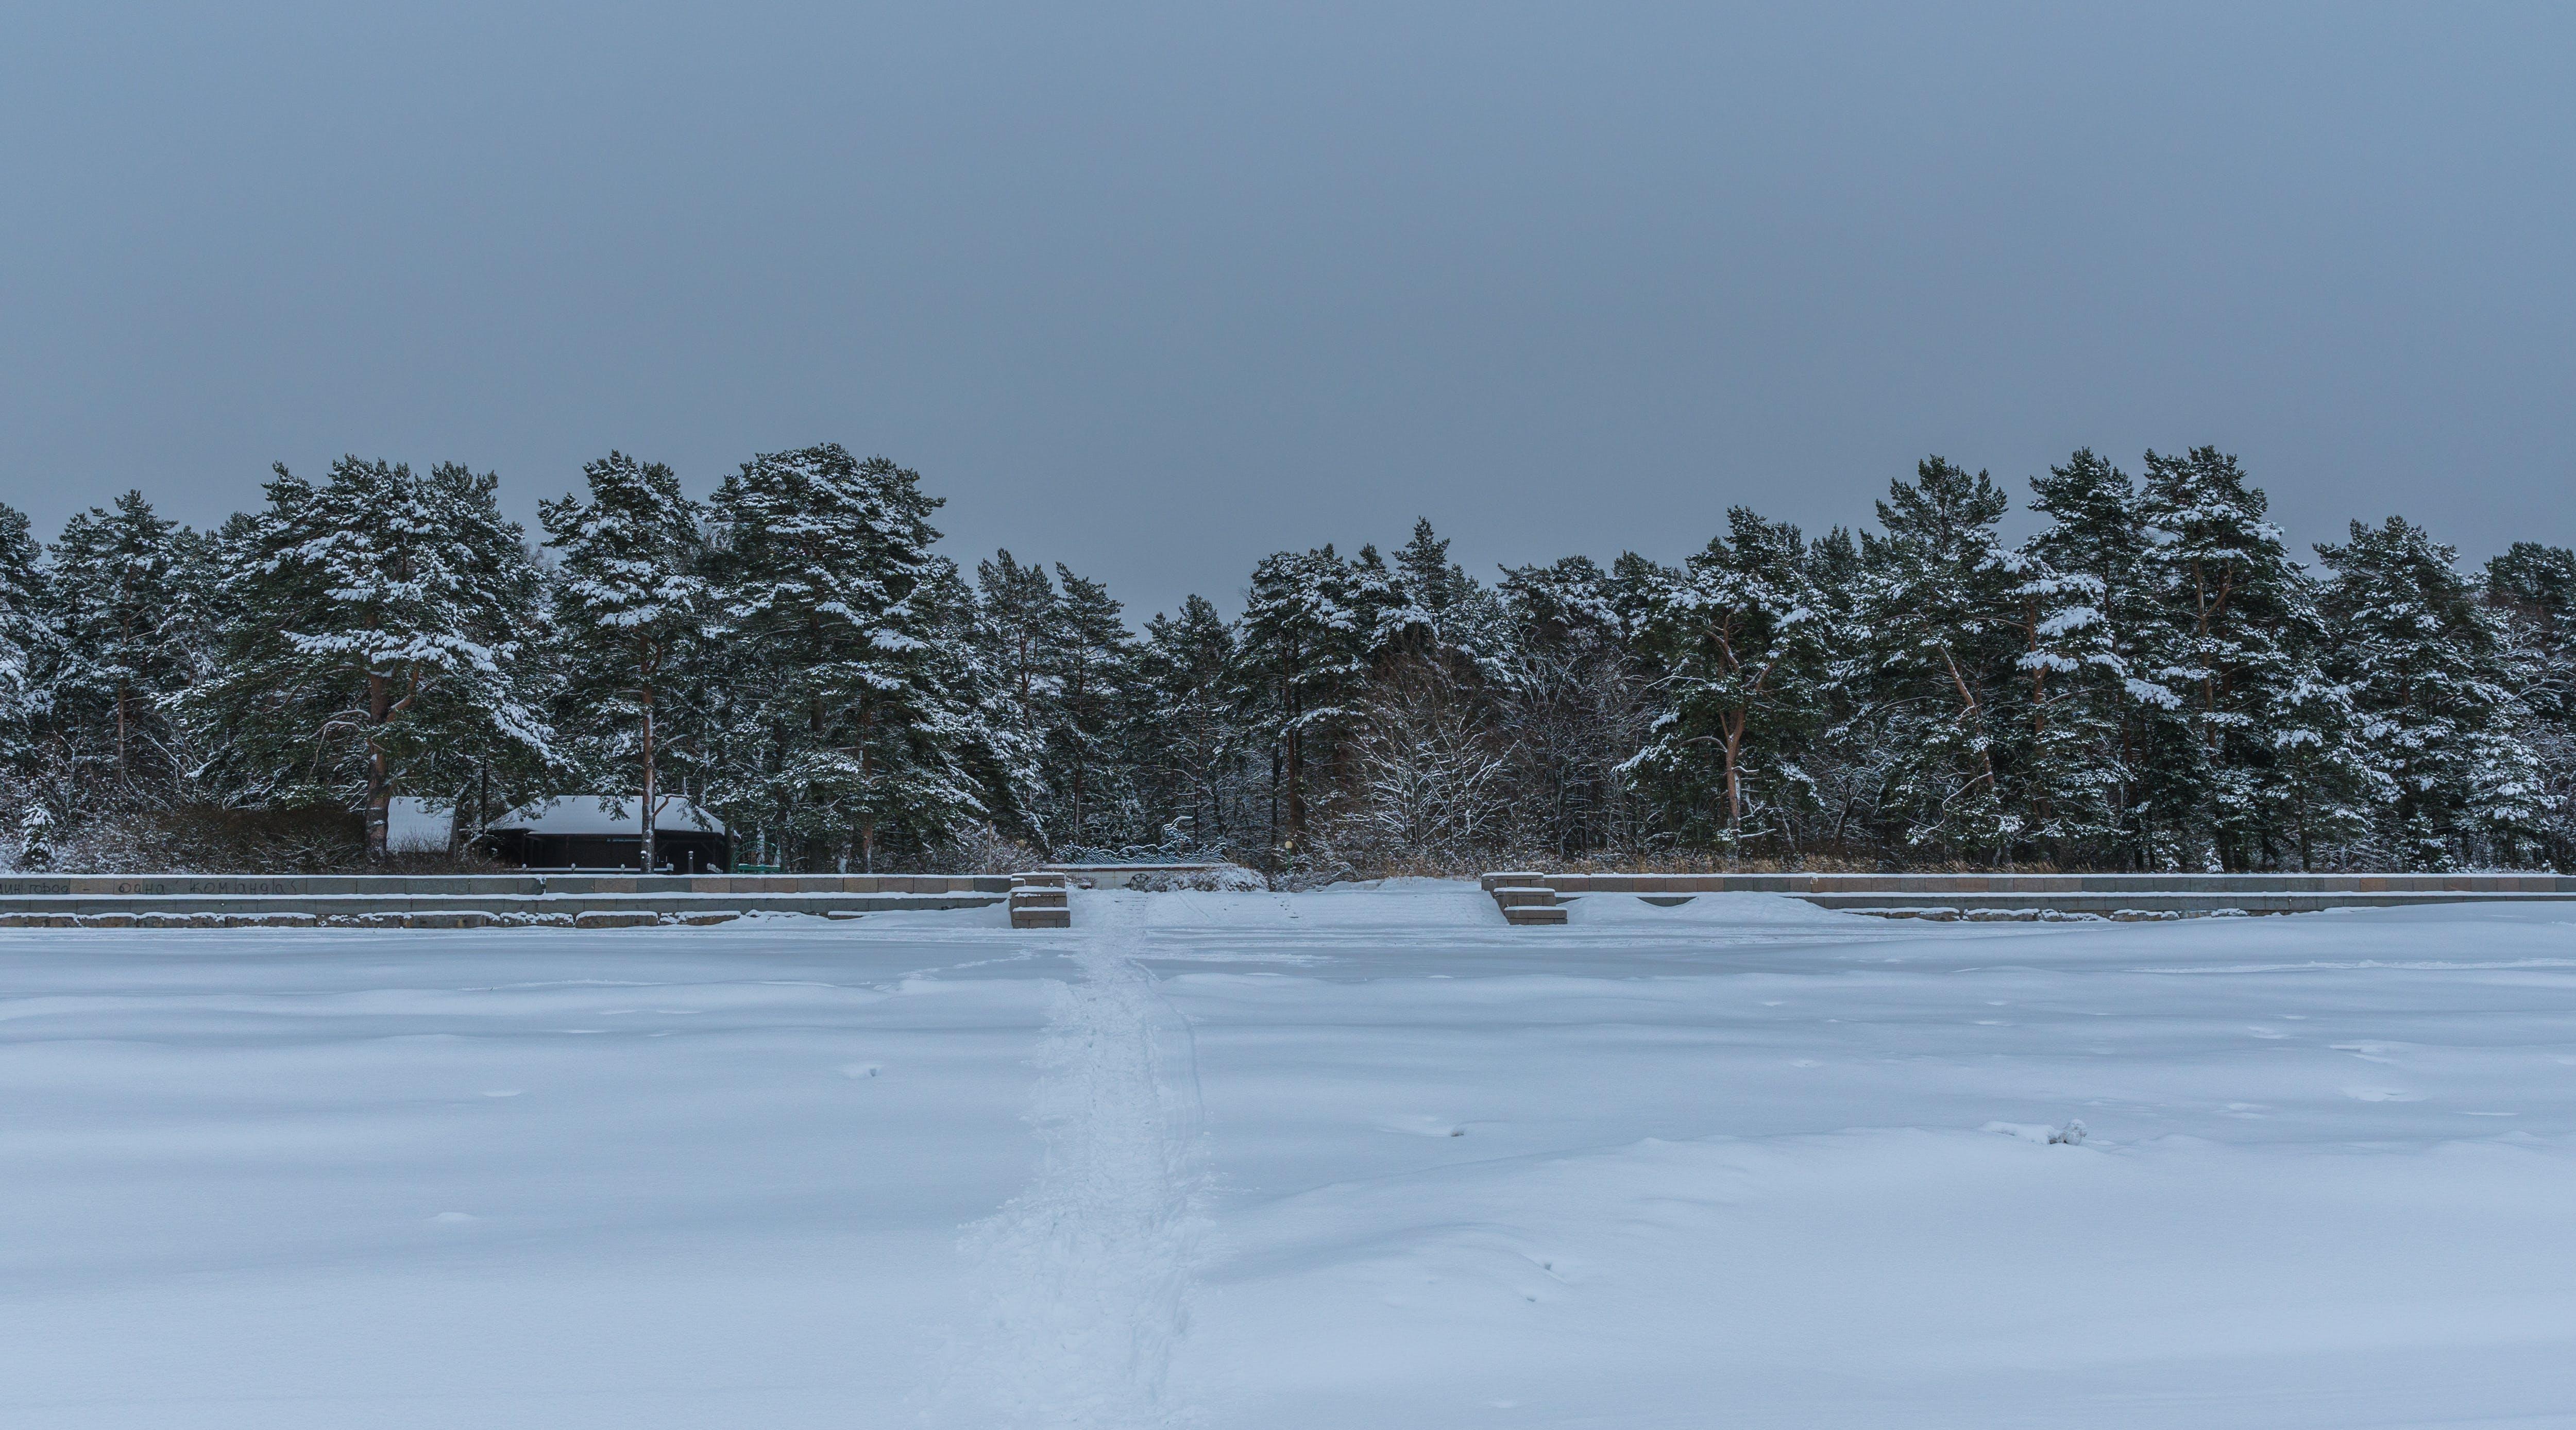 Free stock photo of snow, landscape, trees, winter